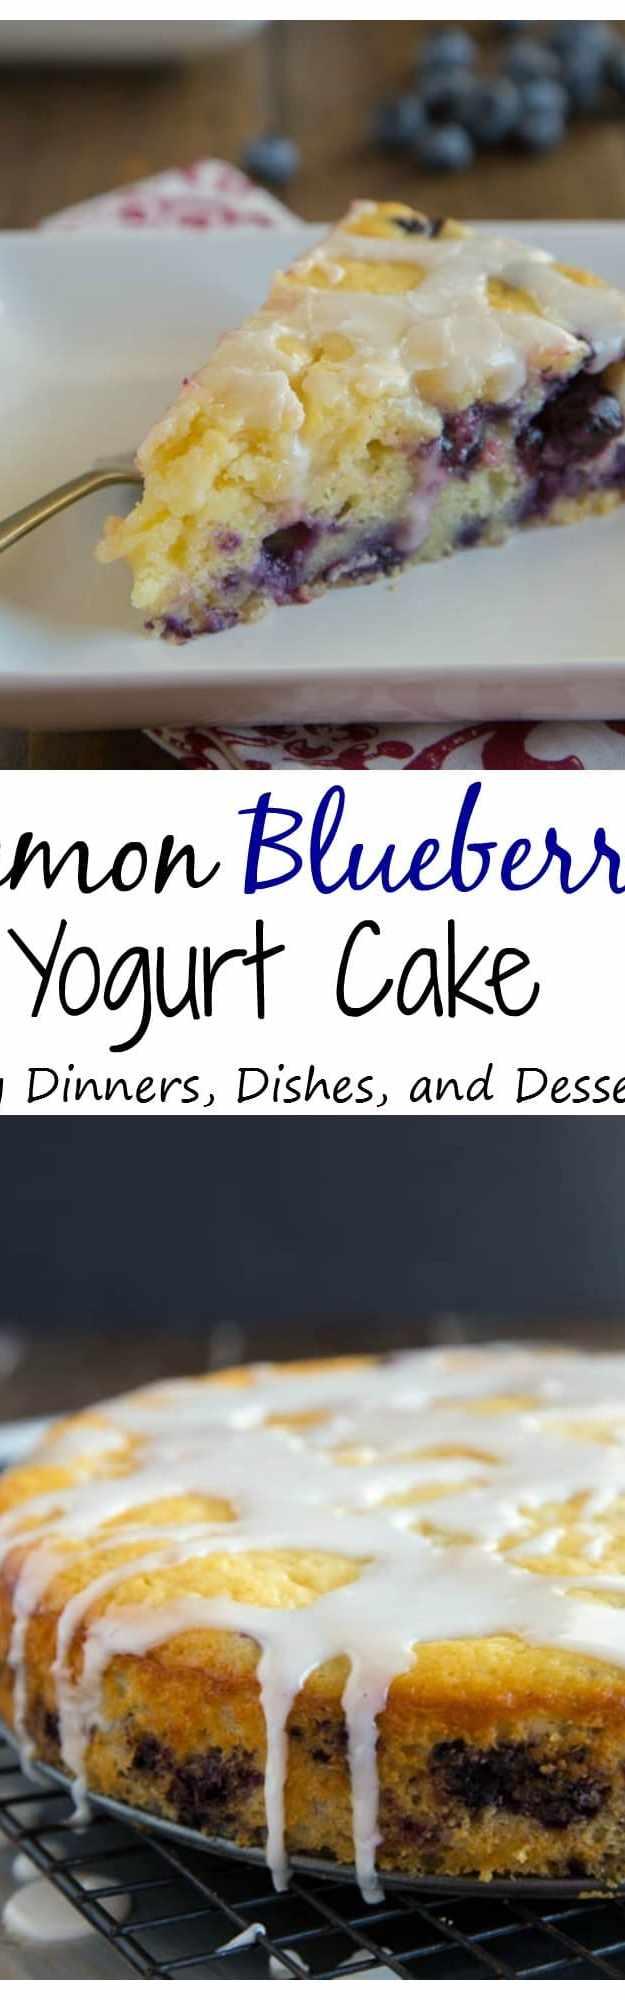 Lemon Blueberry Yogurt Cake - a super moist lemon yogurt cake studded with fresh blueberries and topped with a lemon glaze.